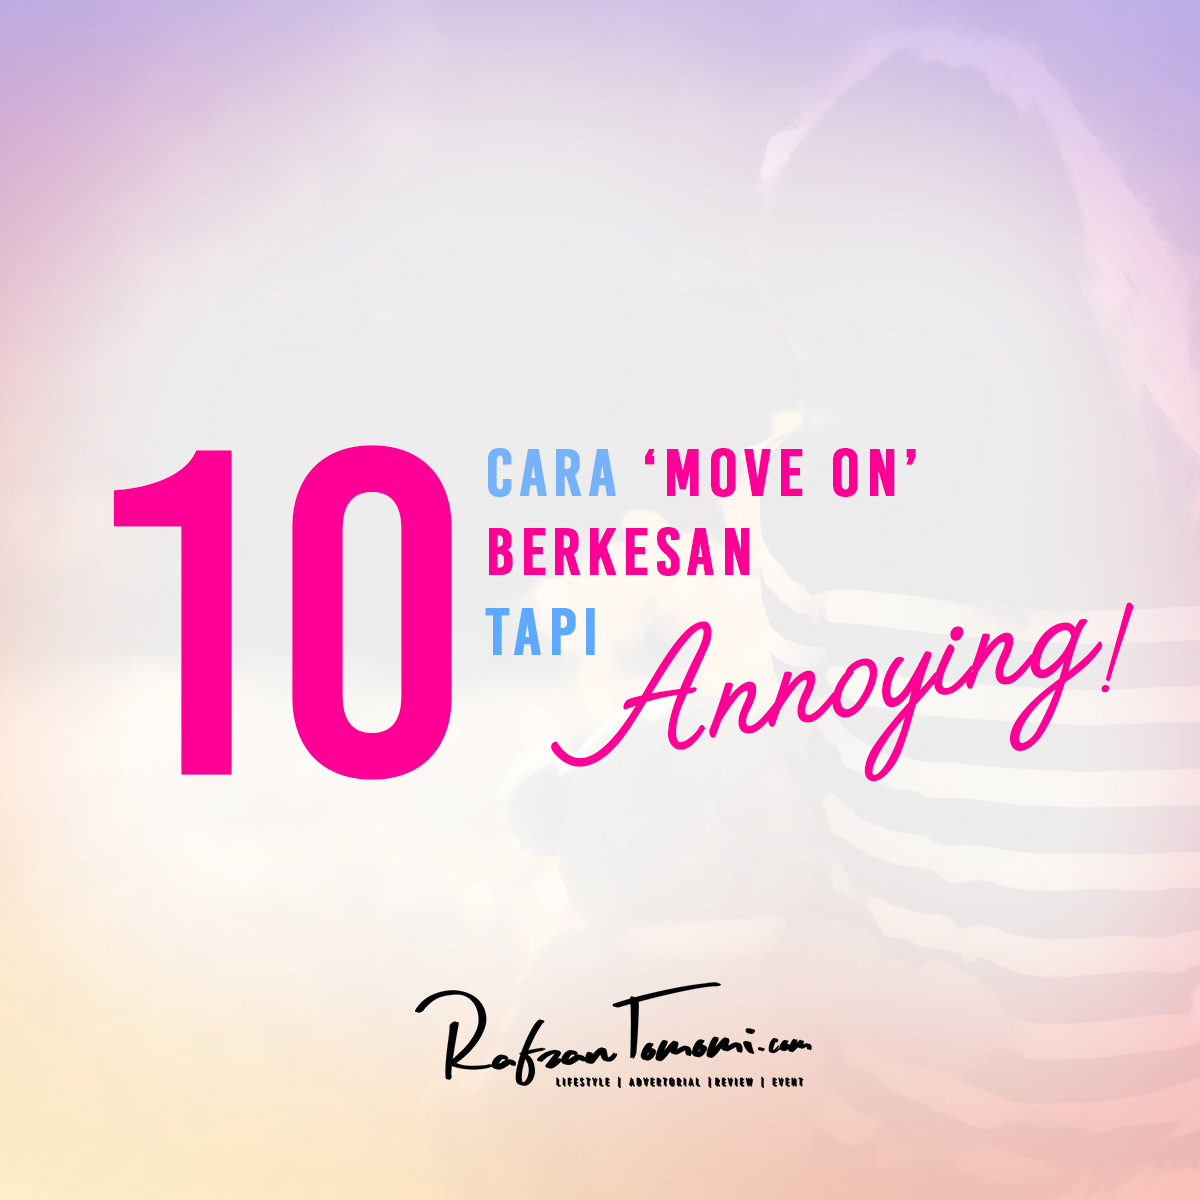 Cara 'Move On' Berkesan Paling Annoying!